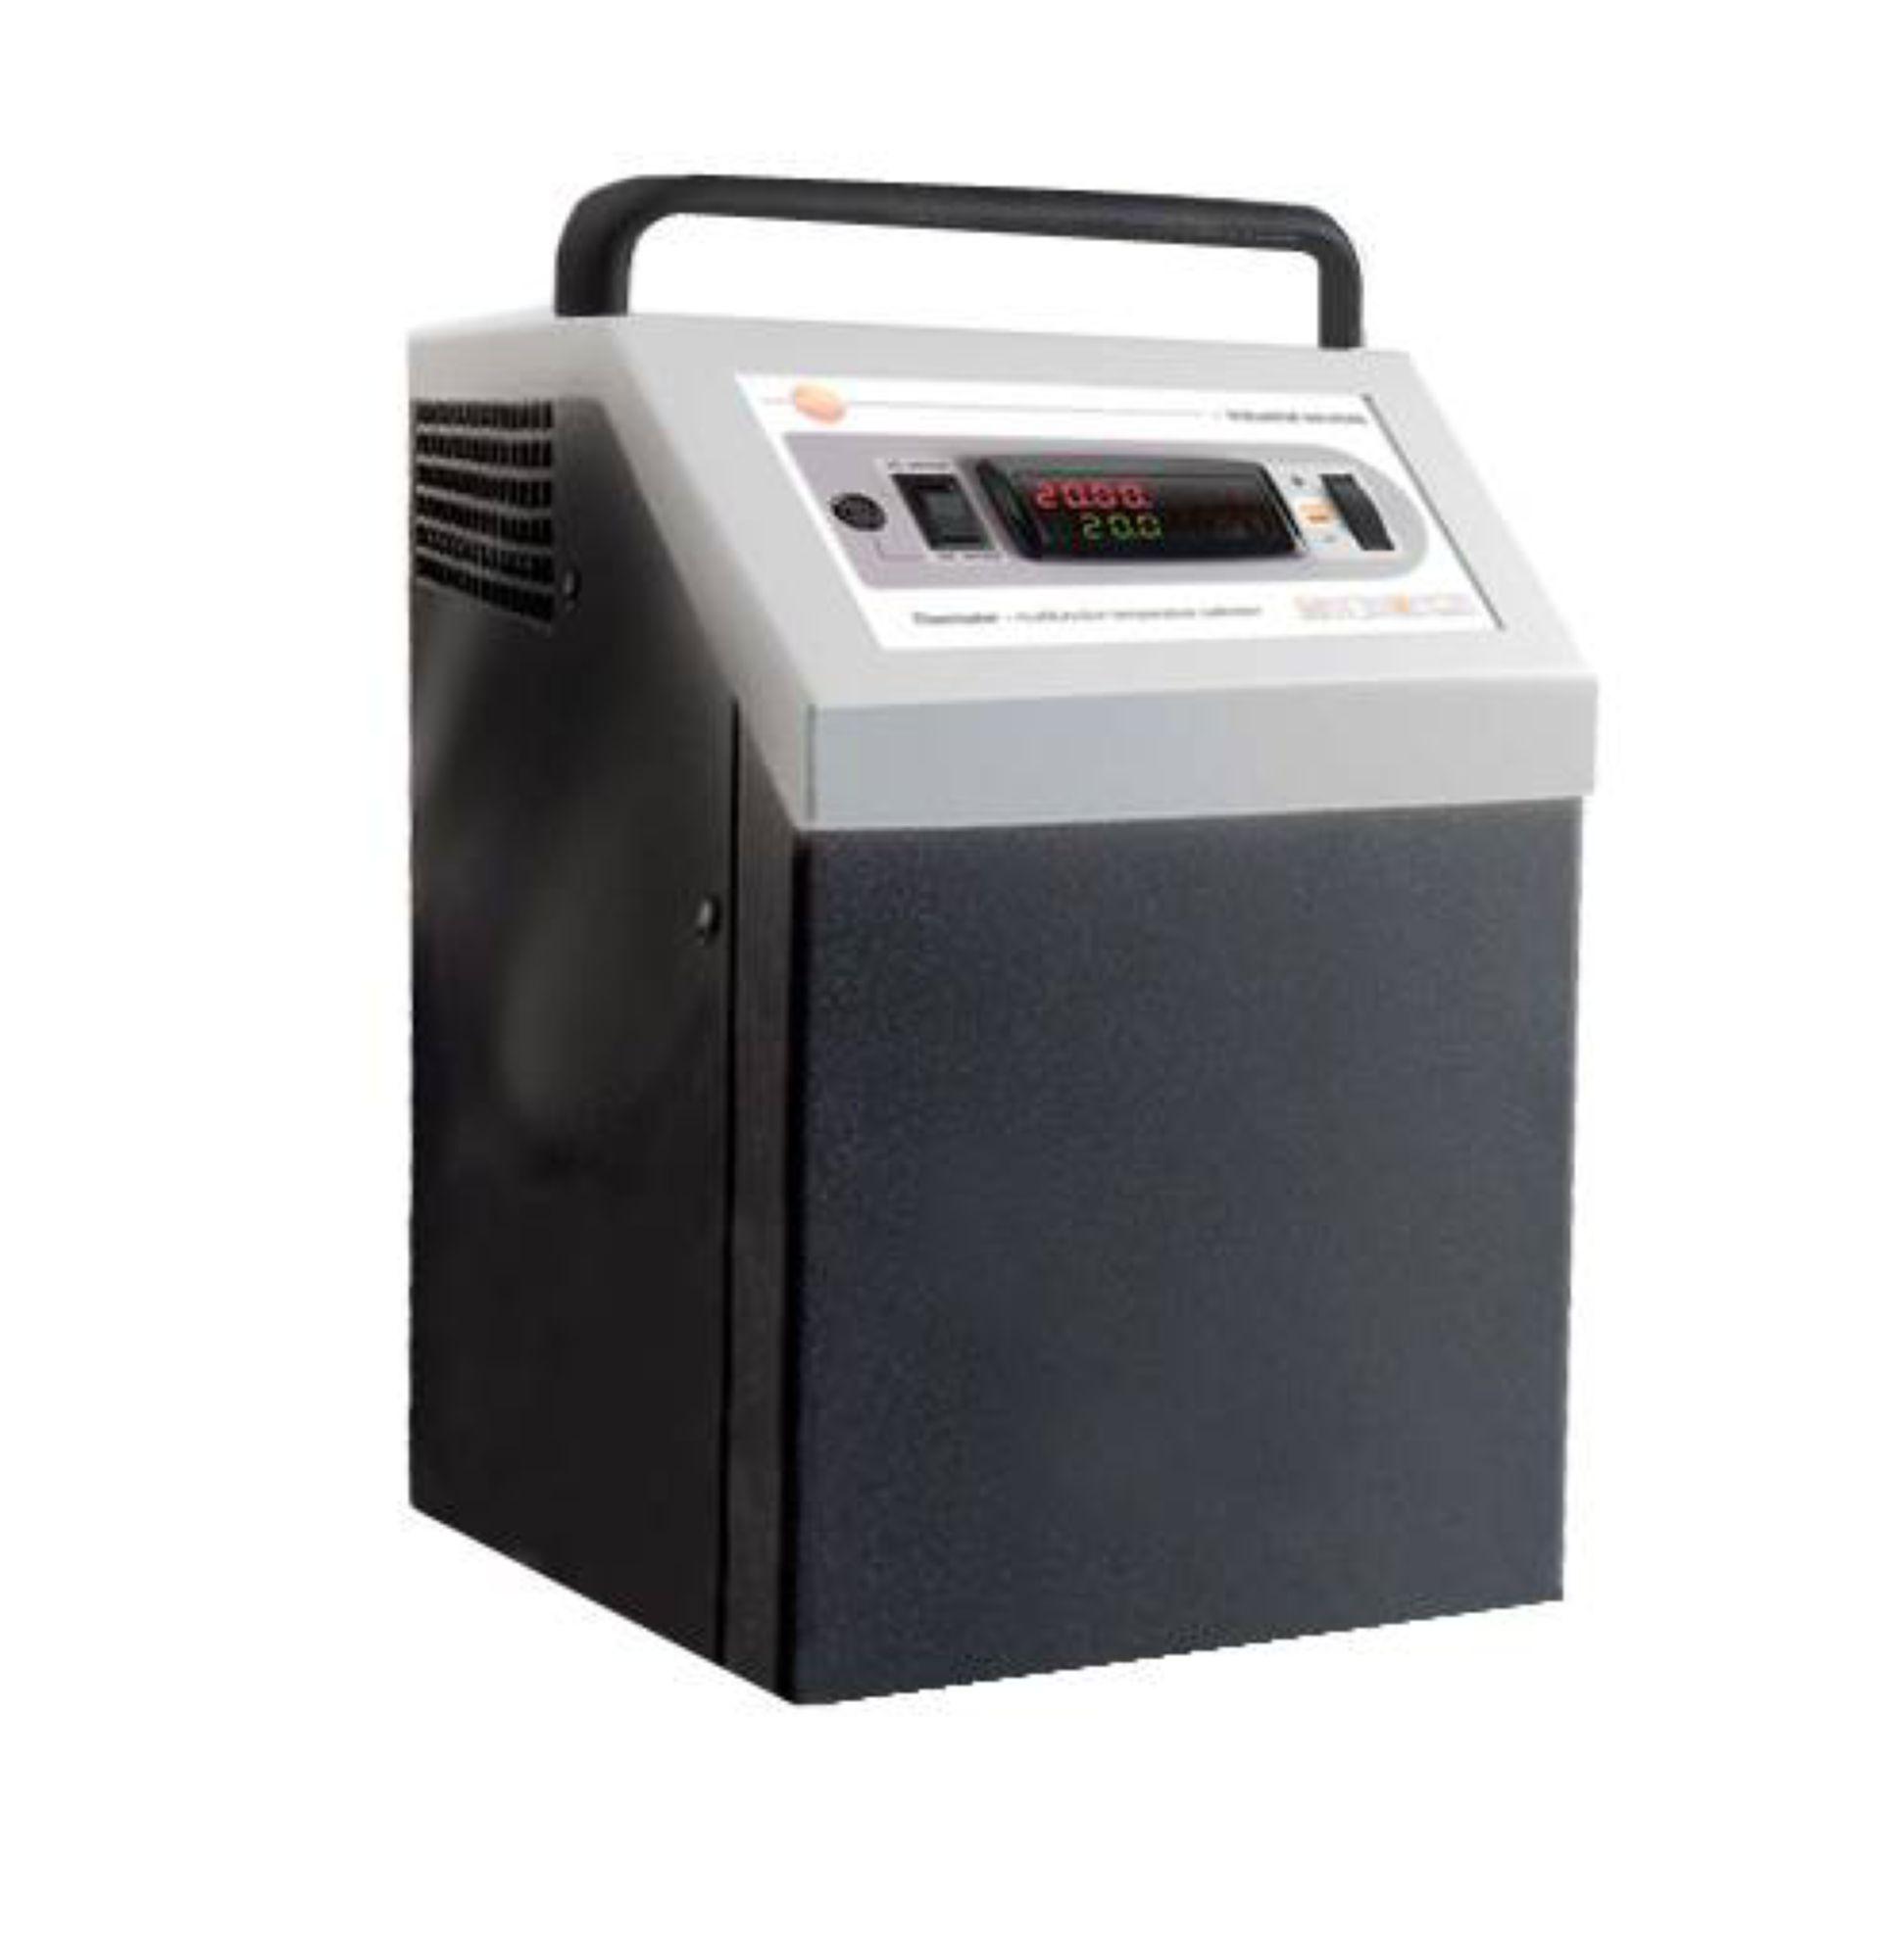 Imag-Thermator-Generador-Temperatura-Calibracion-Temperatura.psd